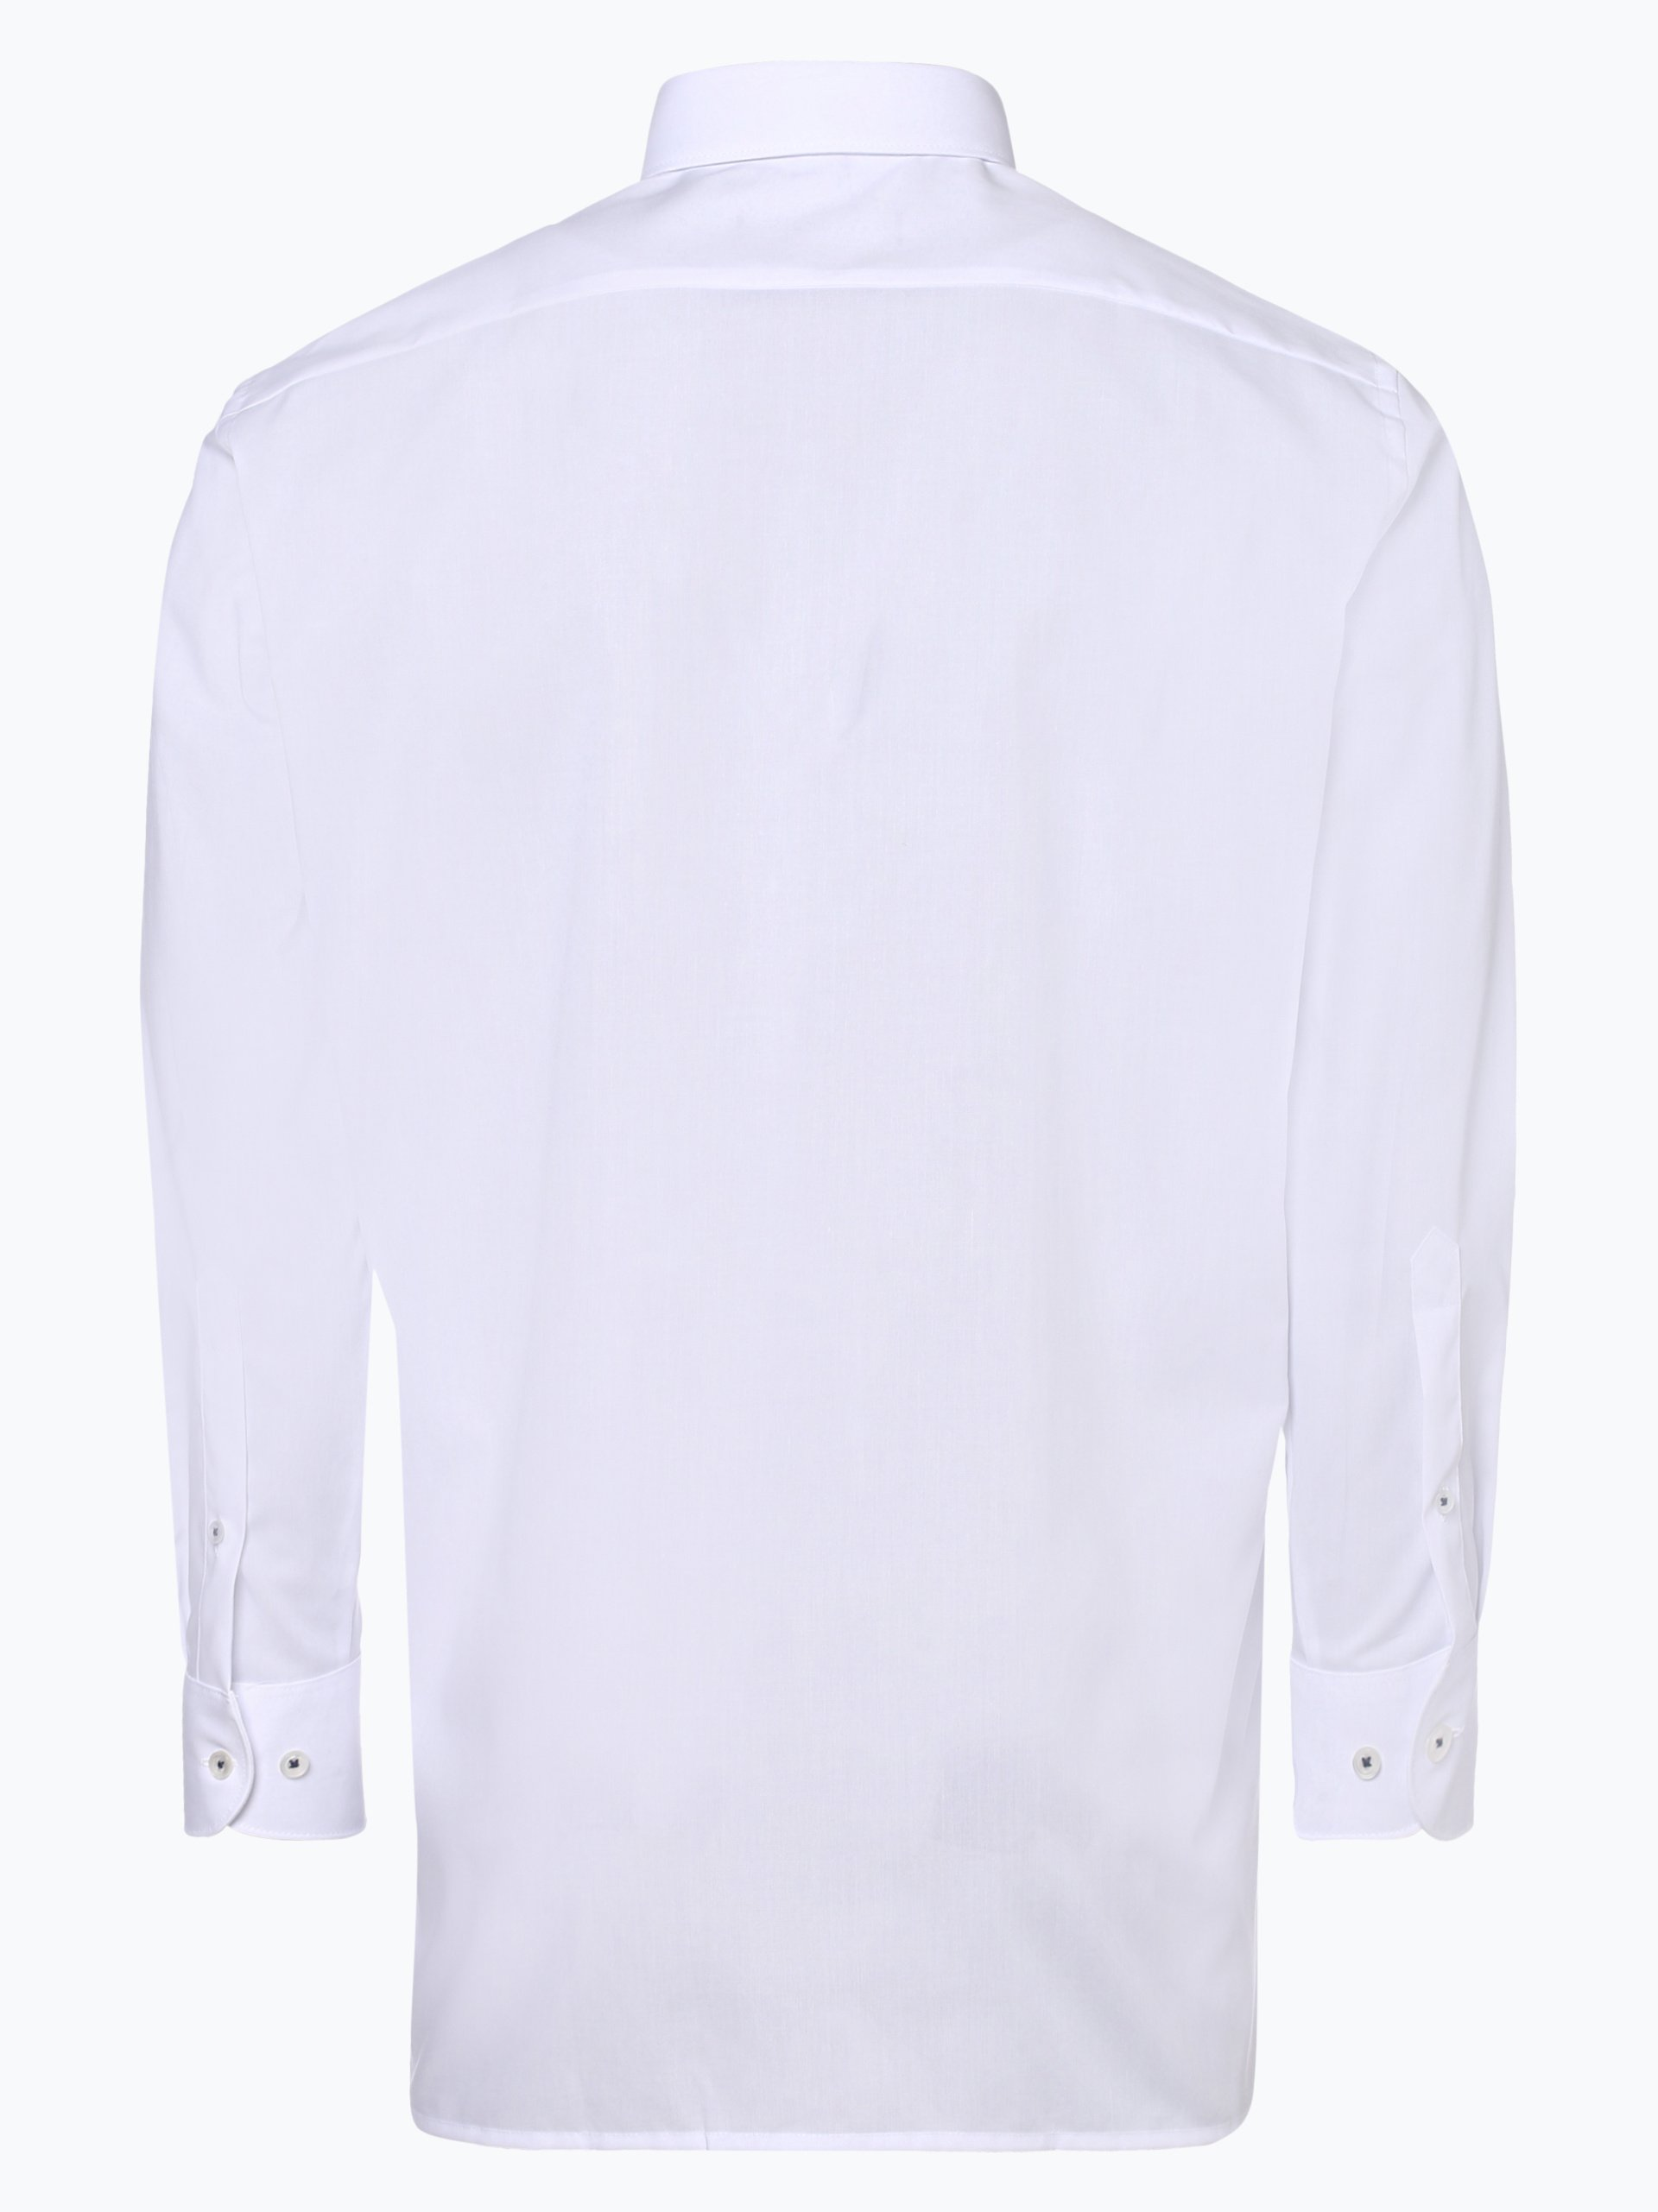 Finshley & Harding Herren Hemd - Bügelleicht - Extrakurze Ärmel